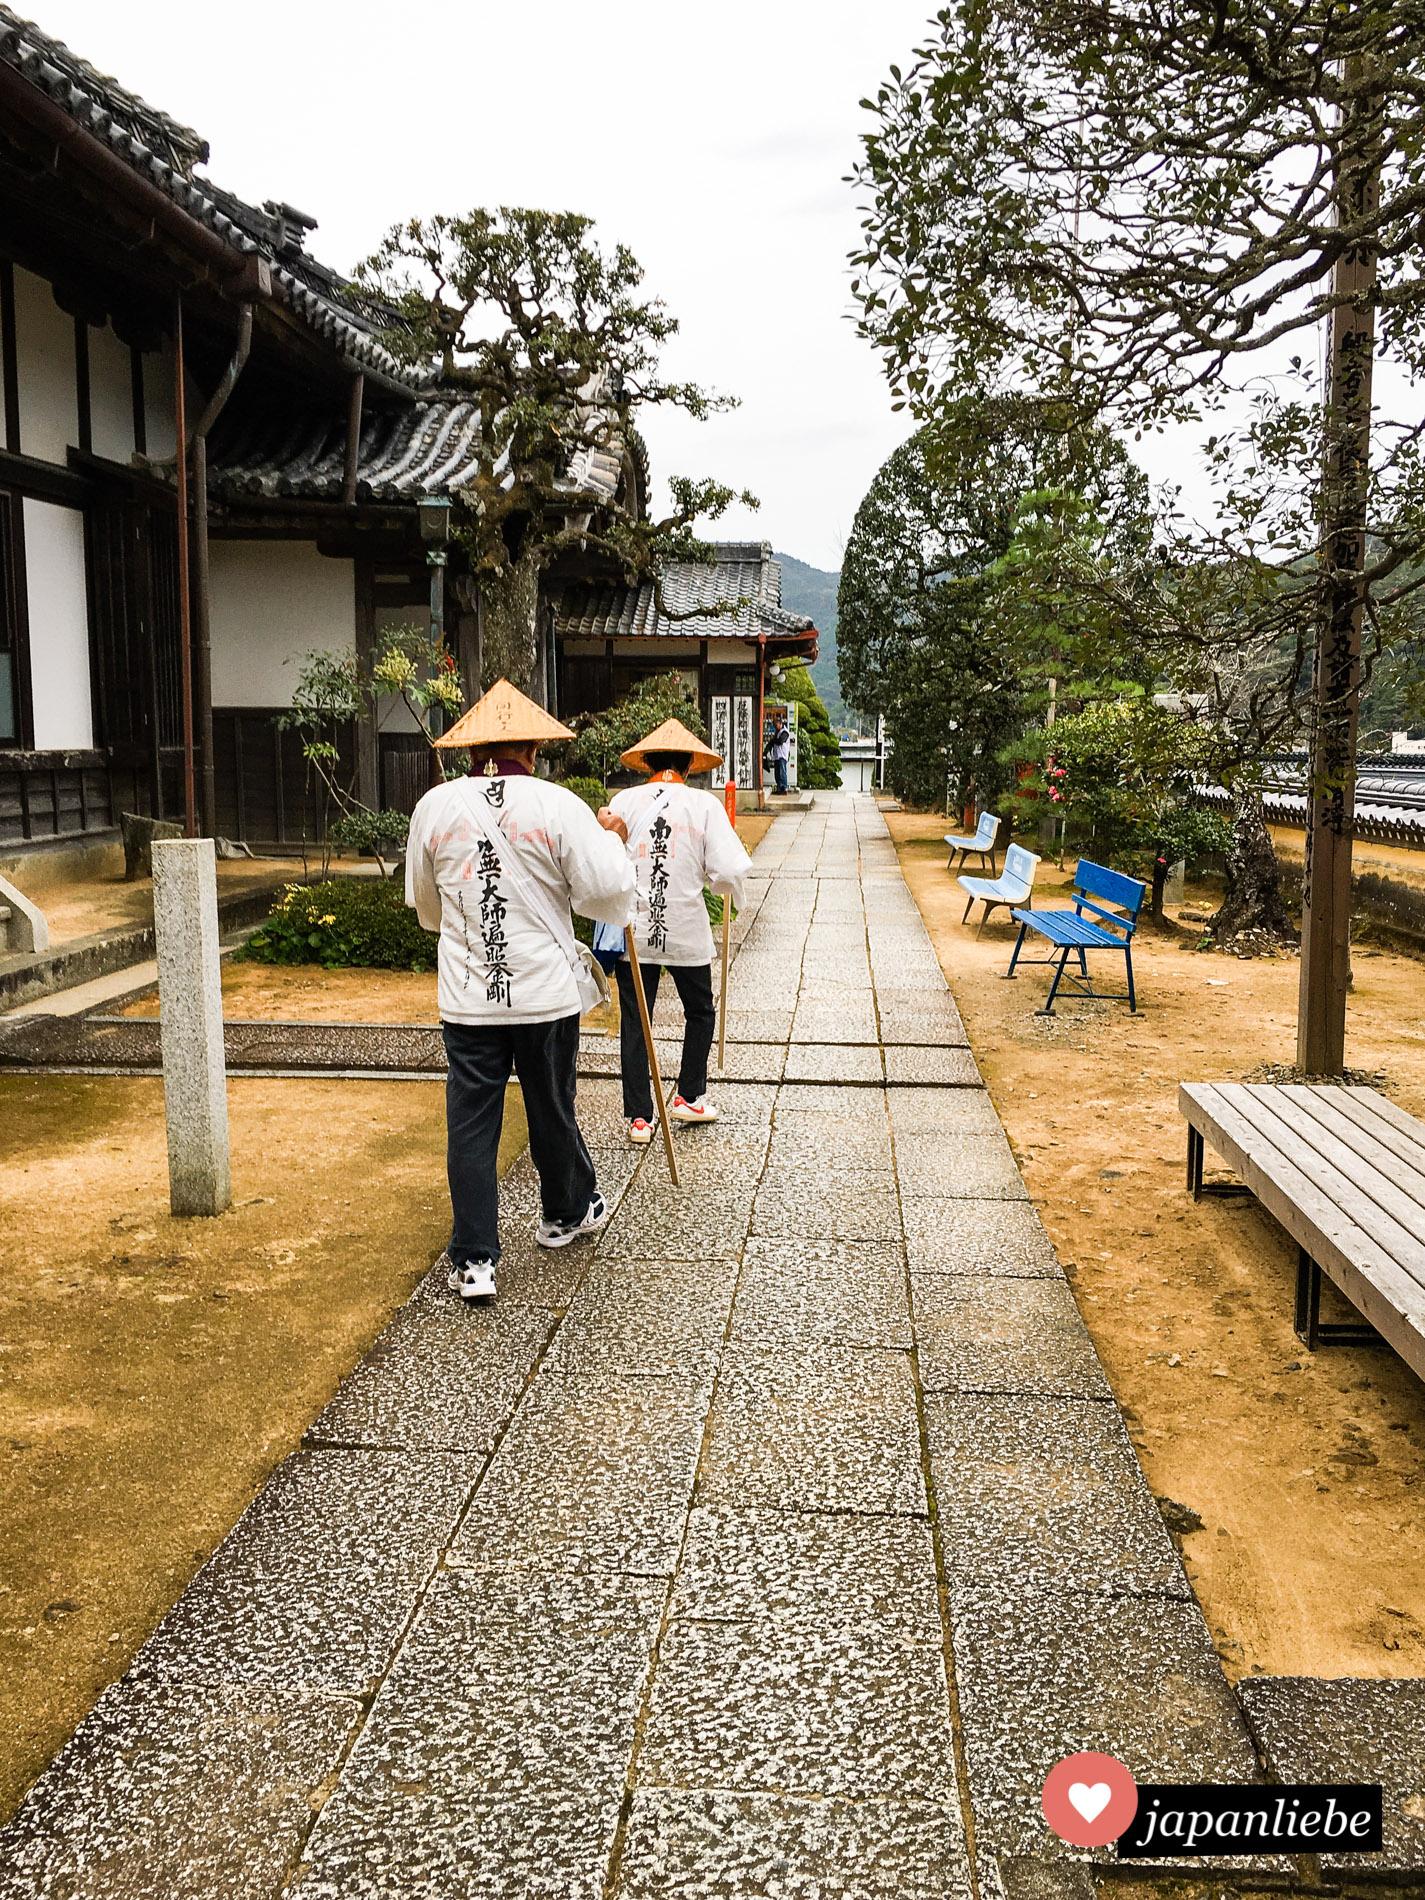 Pilger in Hiwasa am Yakuō-ji – Tempel Nr. 23 der 88-Tempel-Wallfahrt auf Shikoku.